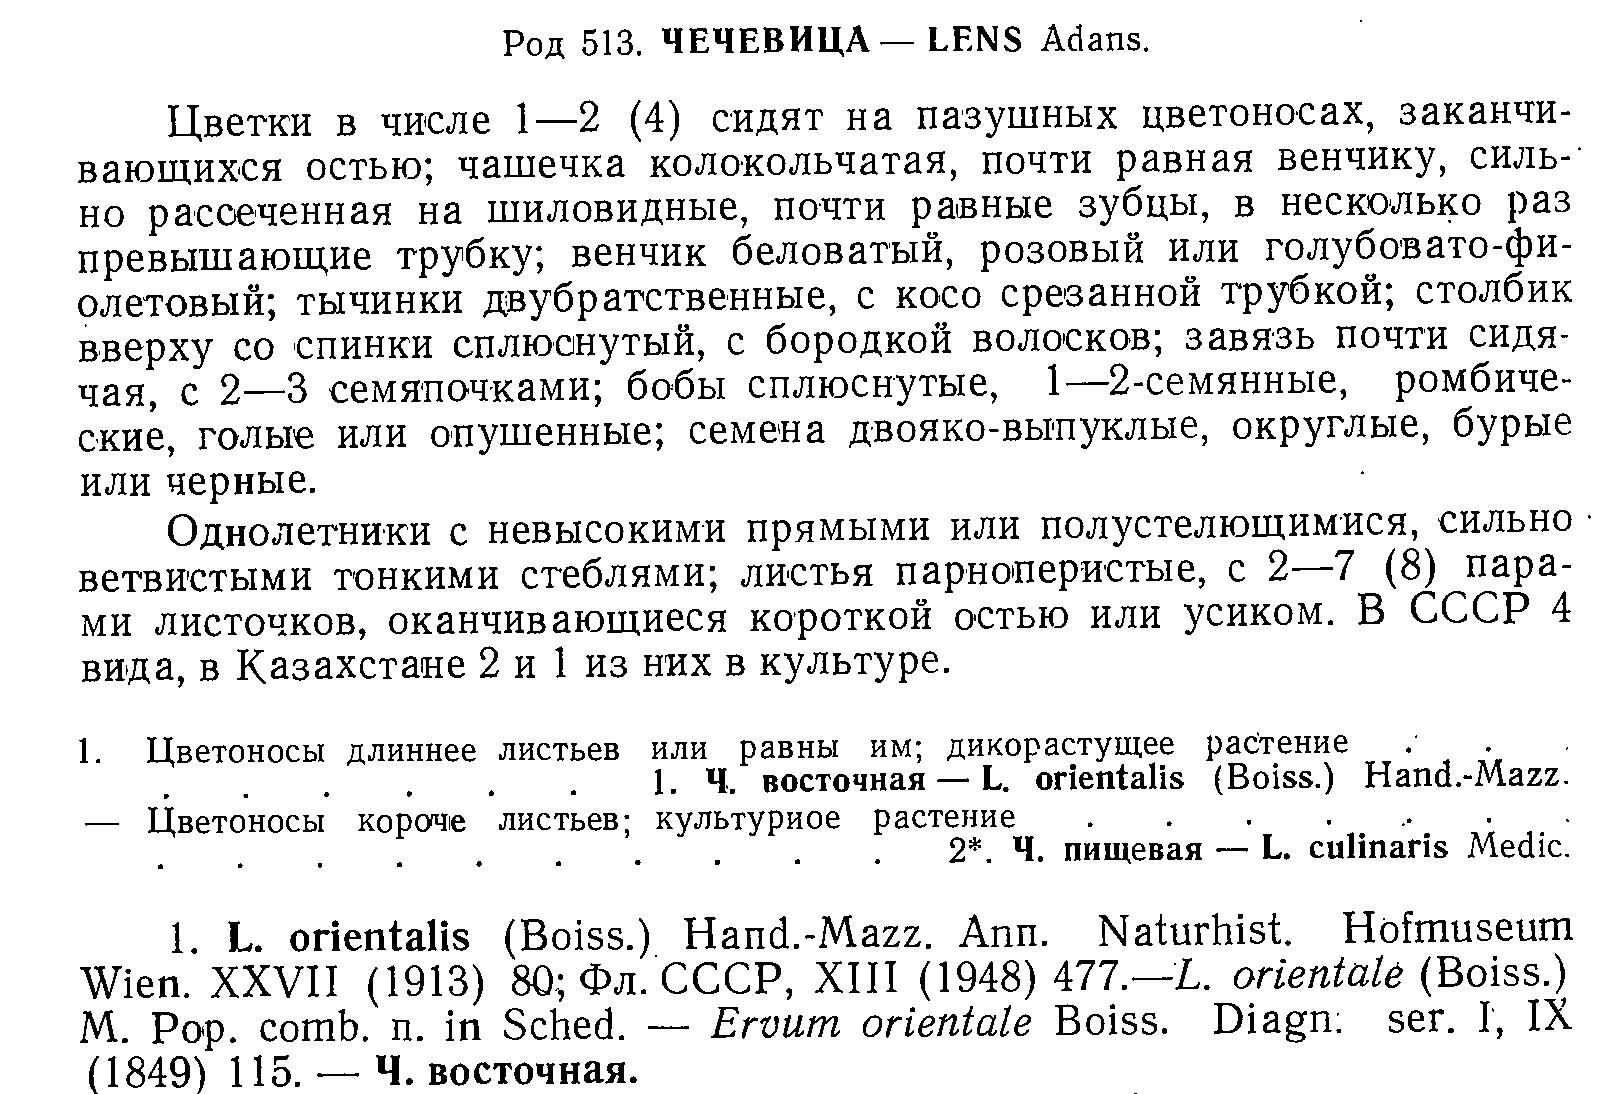 http://forum.plantarium.ru/misc.php?action=pun_attachment&item=18044&download=1